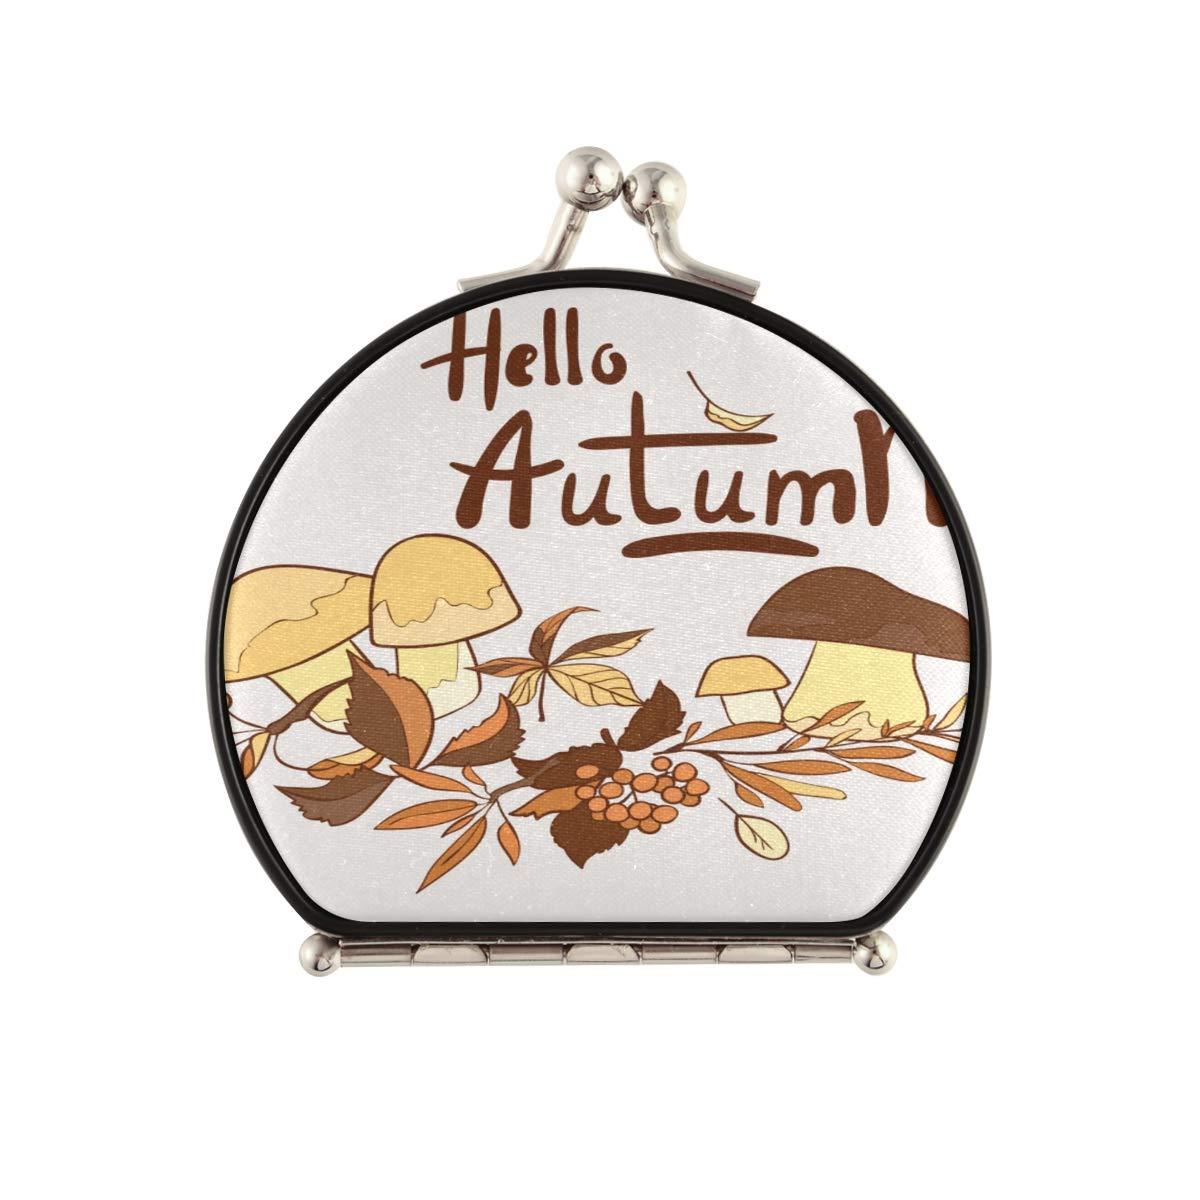 Men'sCompactMirror Wild Fort Worth wholesale Mall Life Mushroom Cute Cartoon PortableCo